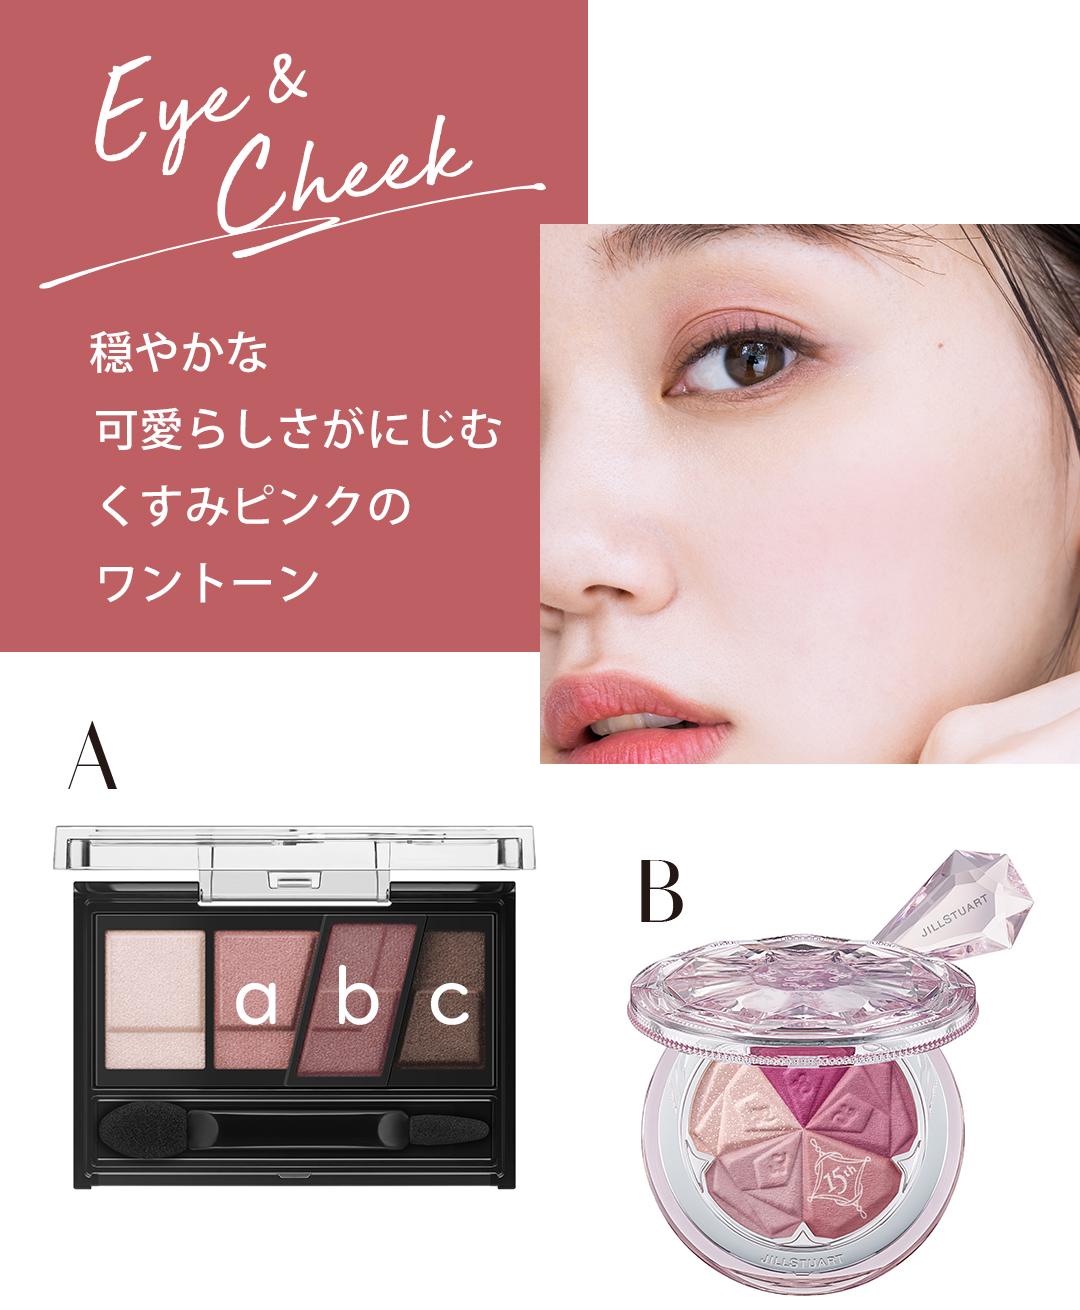 EYE & CHEEK 穏やかな可愛らしさがにじむ くすみピンクのワントーン